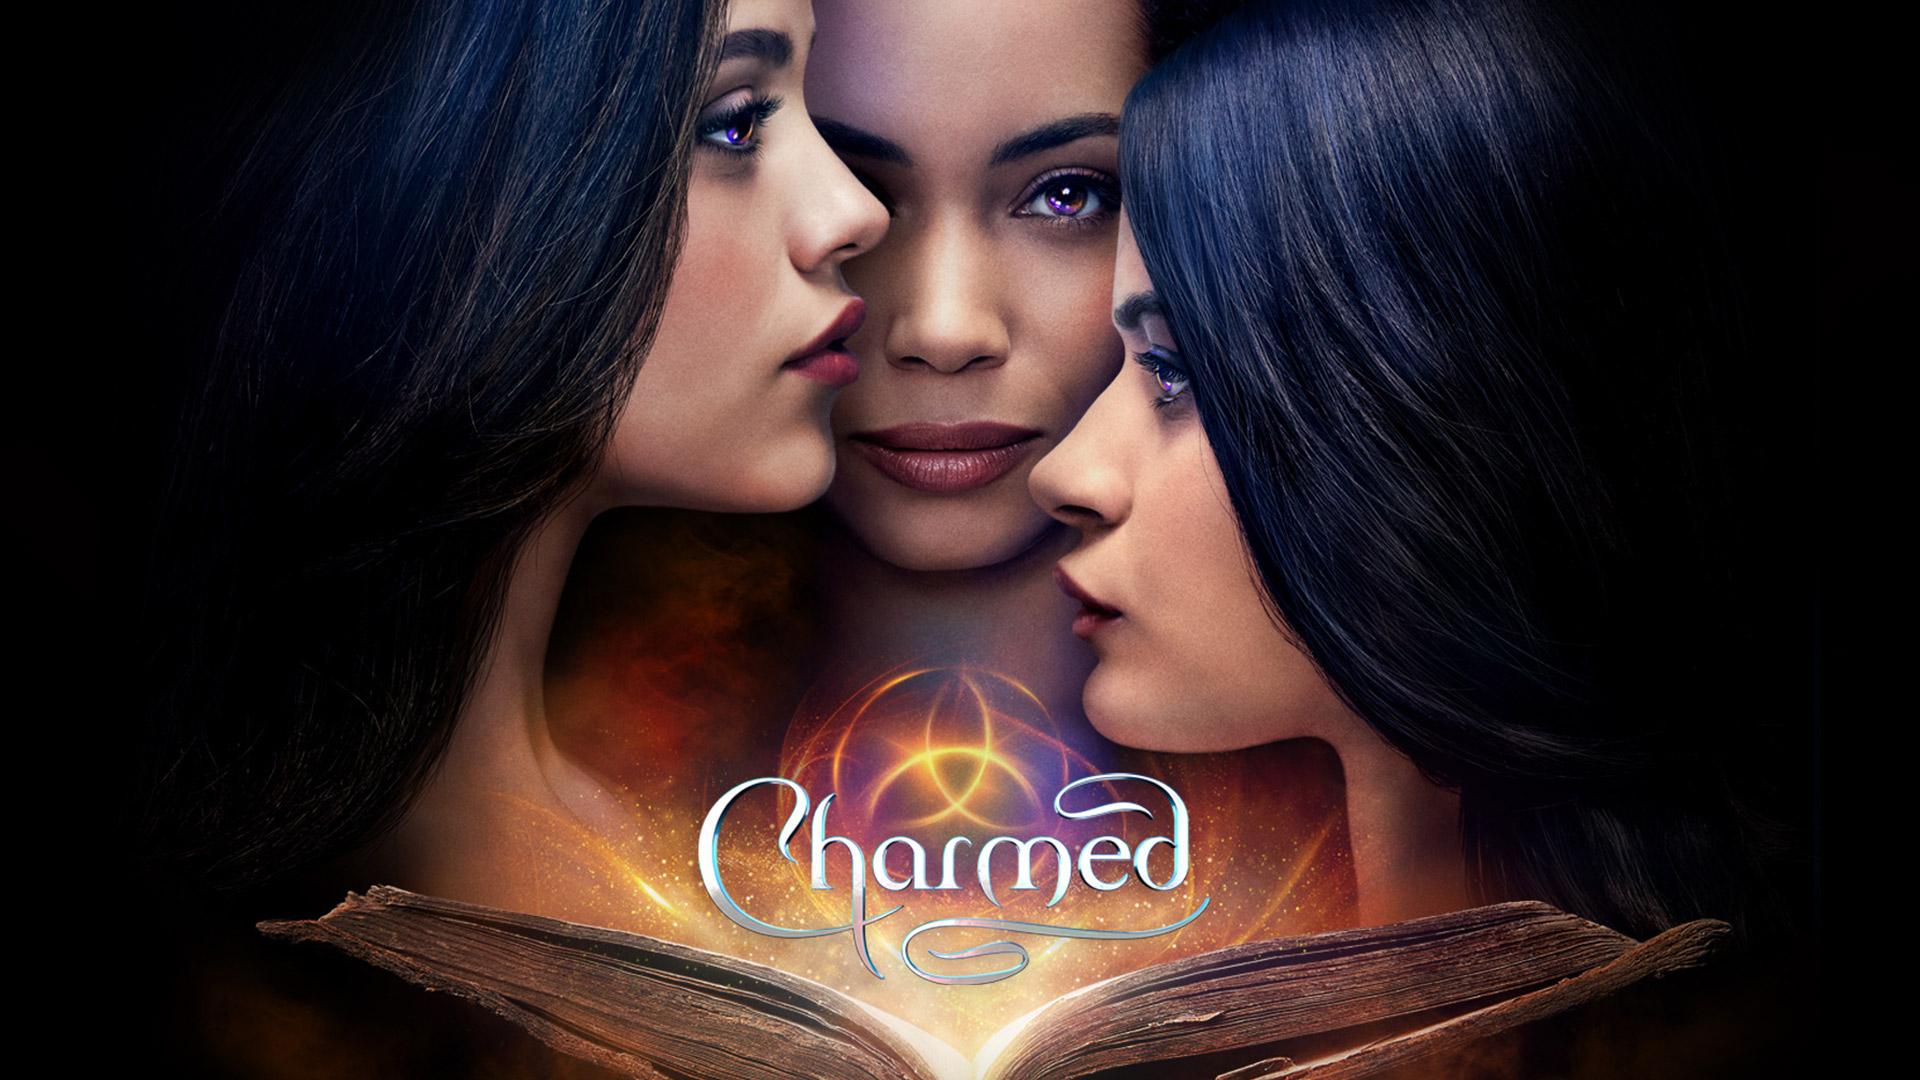 Charmed, Season 1